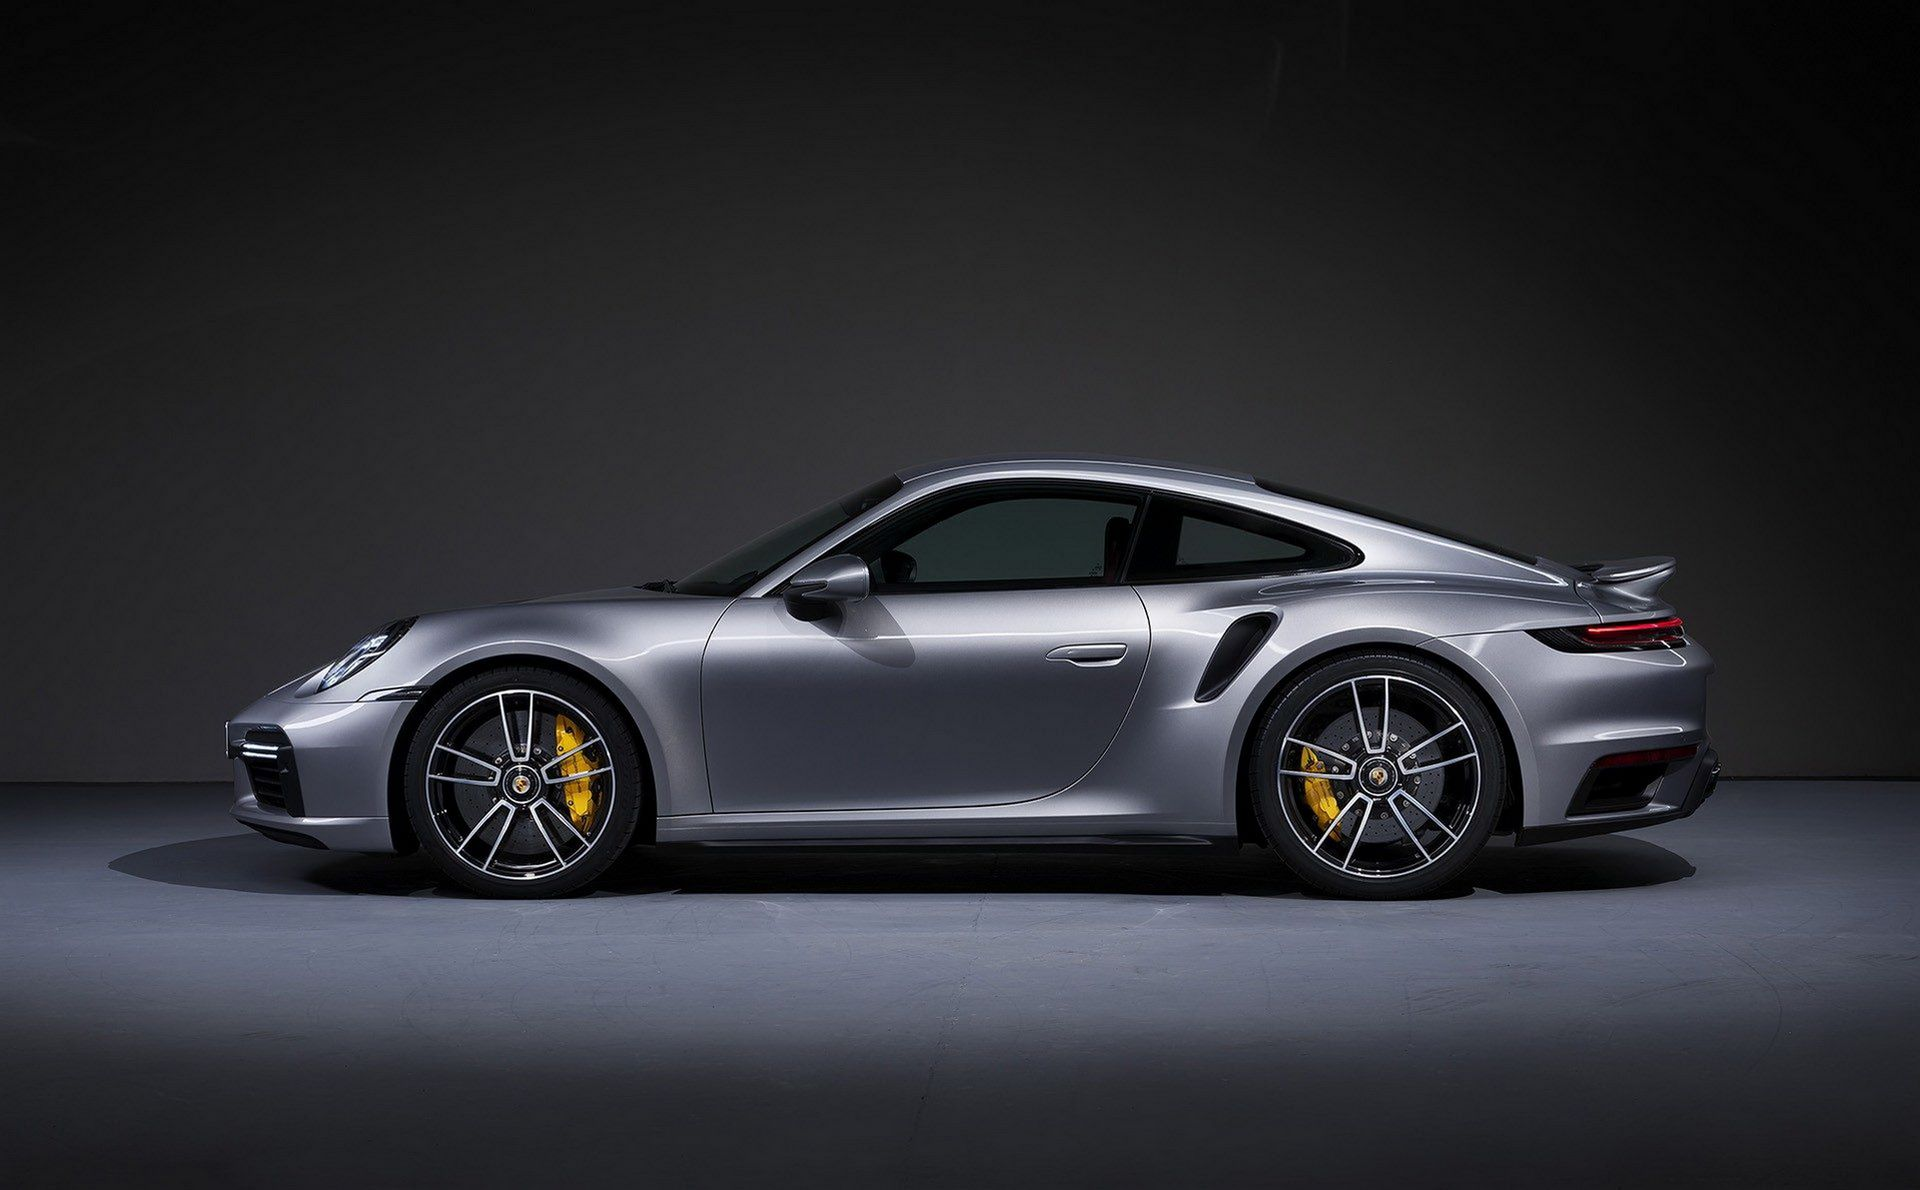 Porsche-911-Turbo-S-2020-14